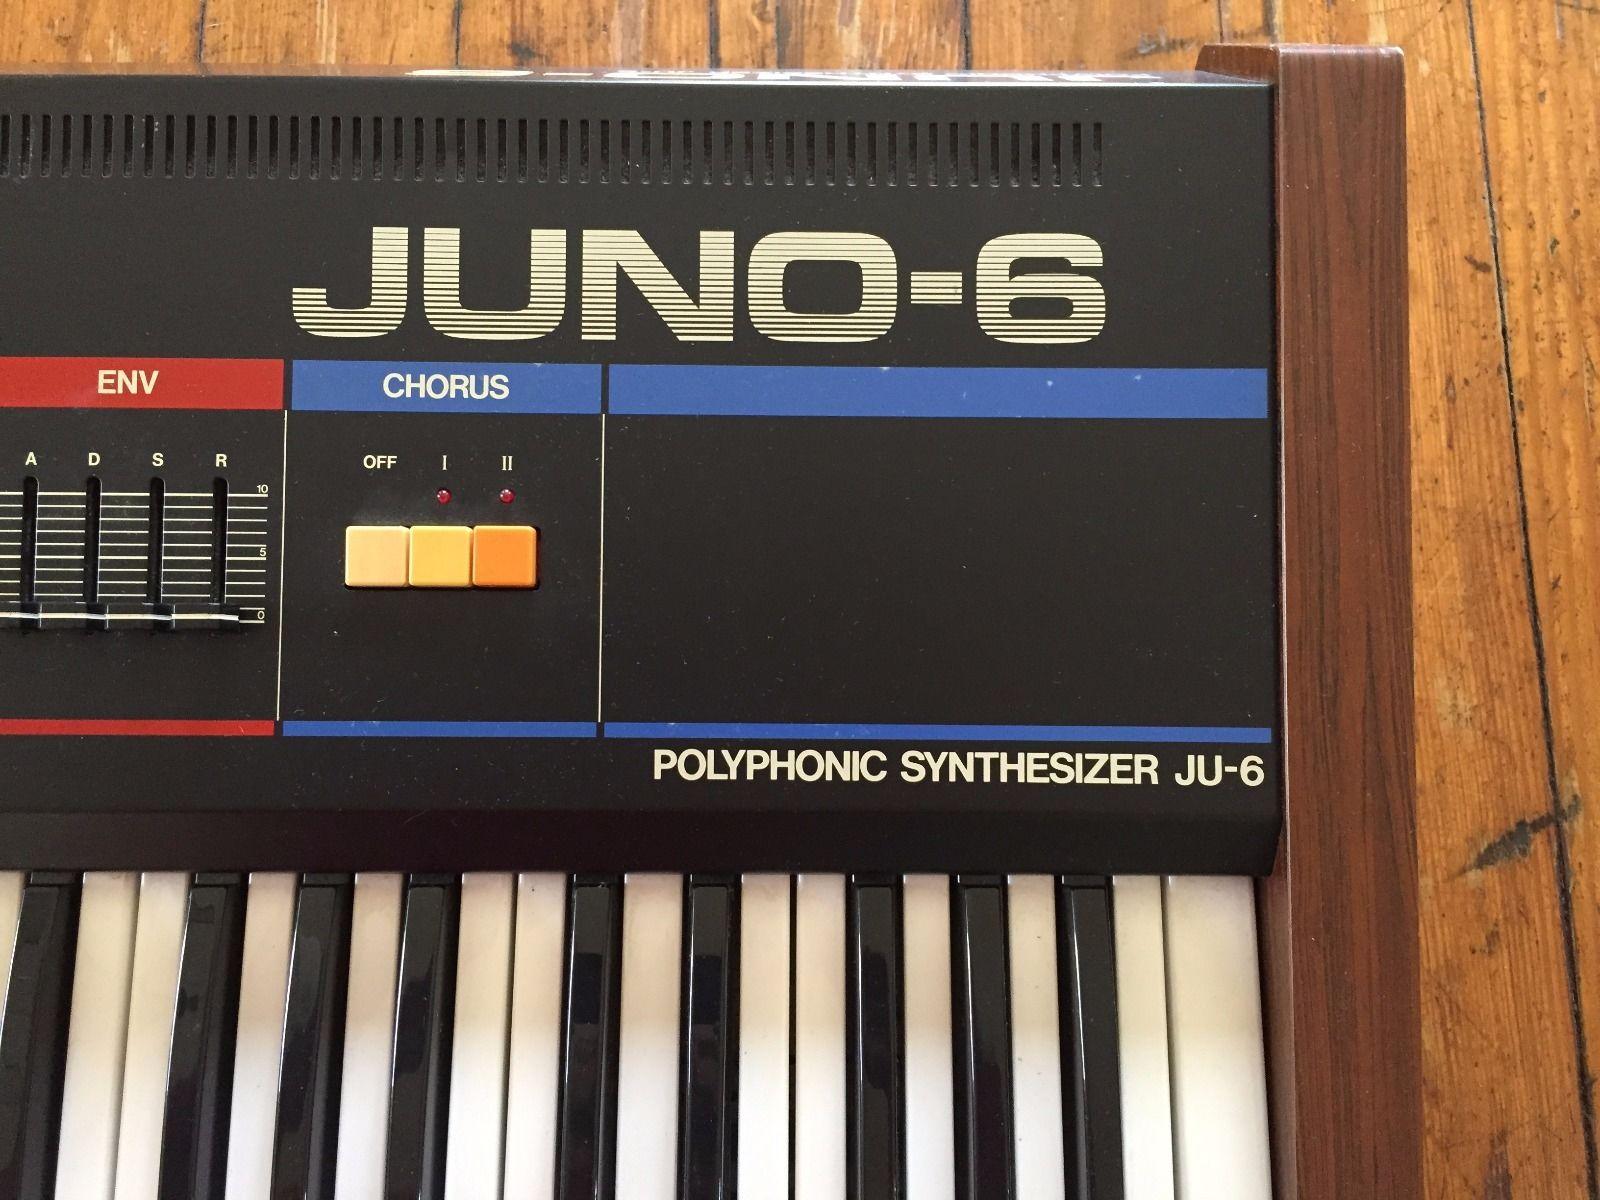 Matrixsynth Roland Juno 6 Synthesizer Sn 204919 Mono To Stereo 3